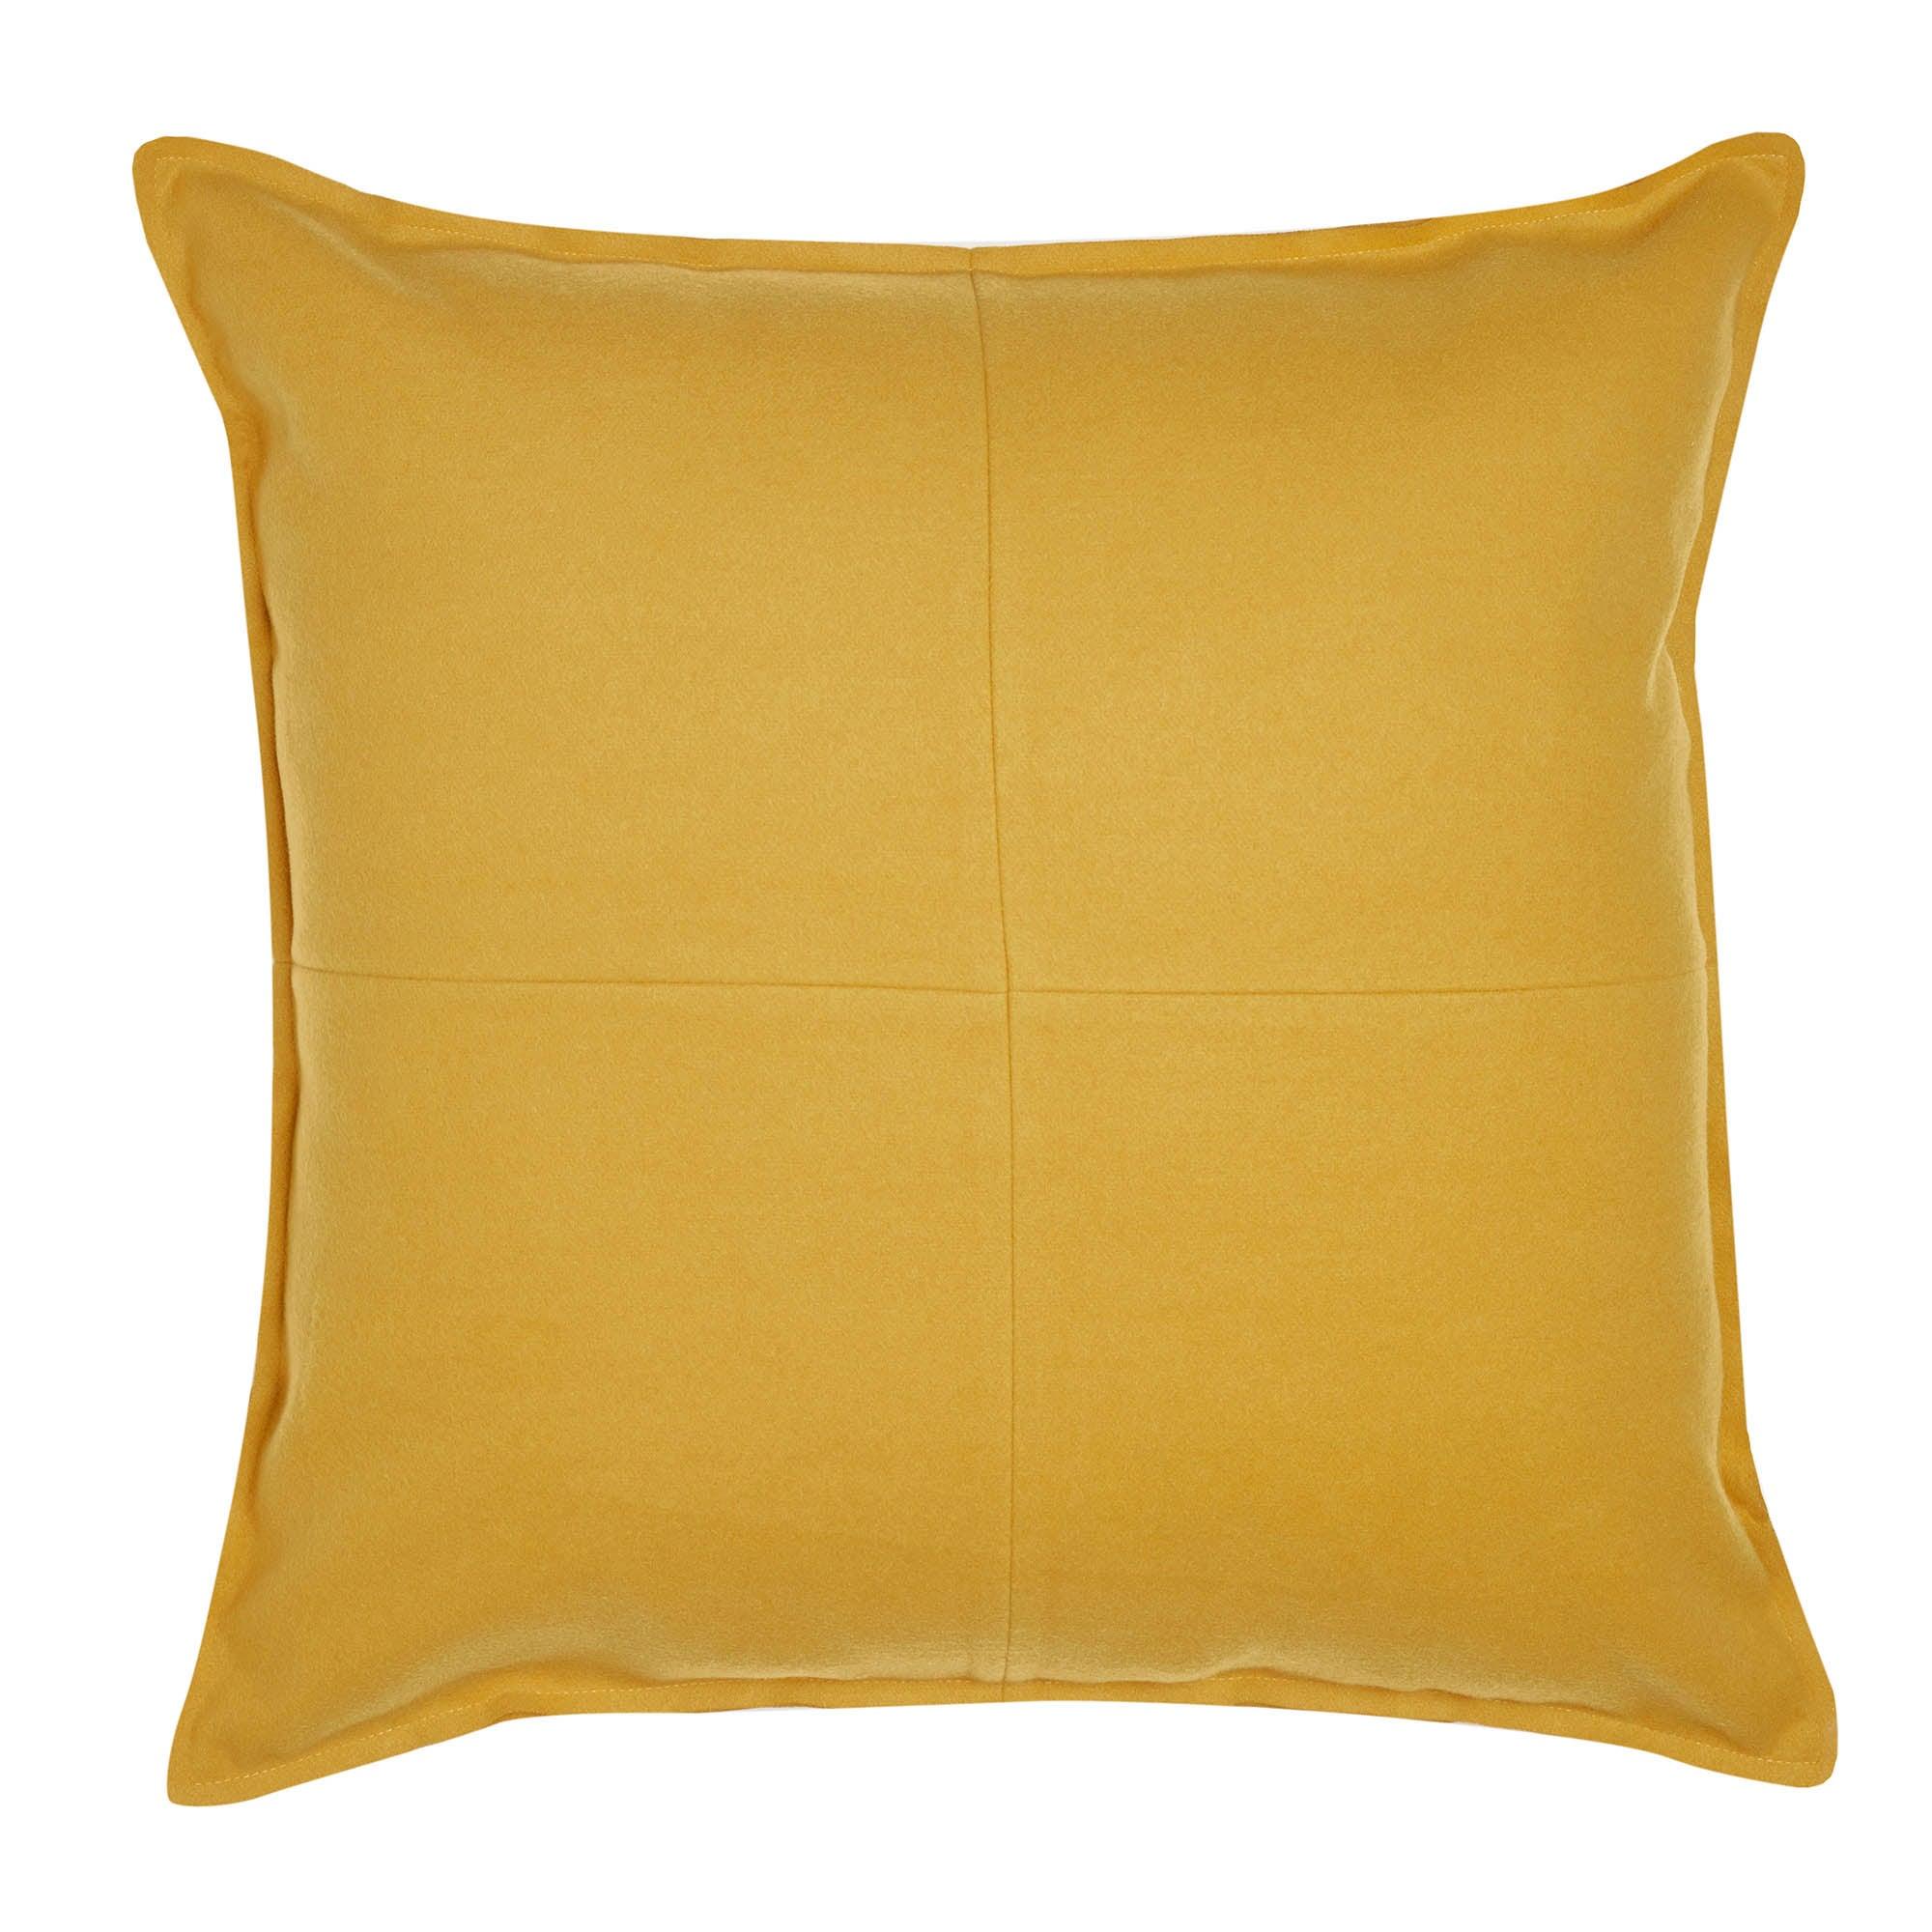 Ochre Patchwork Felt Cushion Ochre (Yellow)